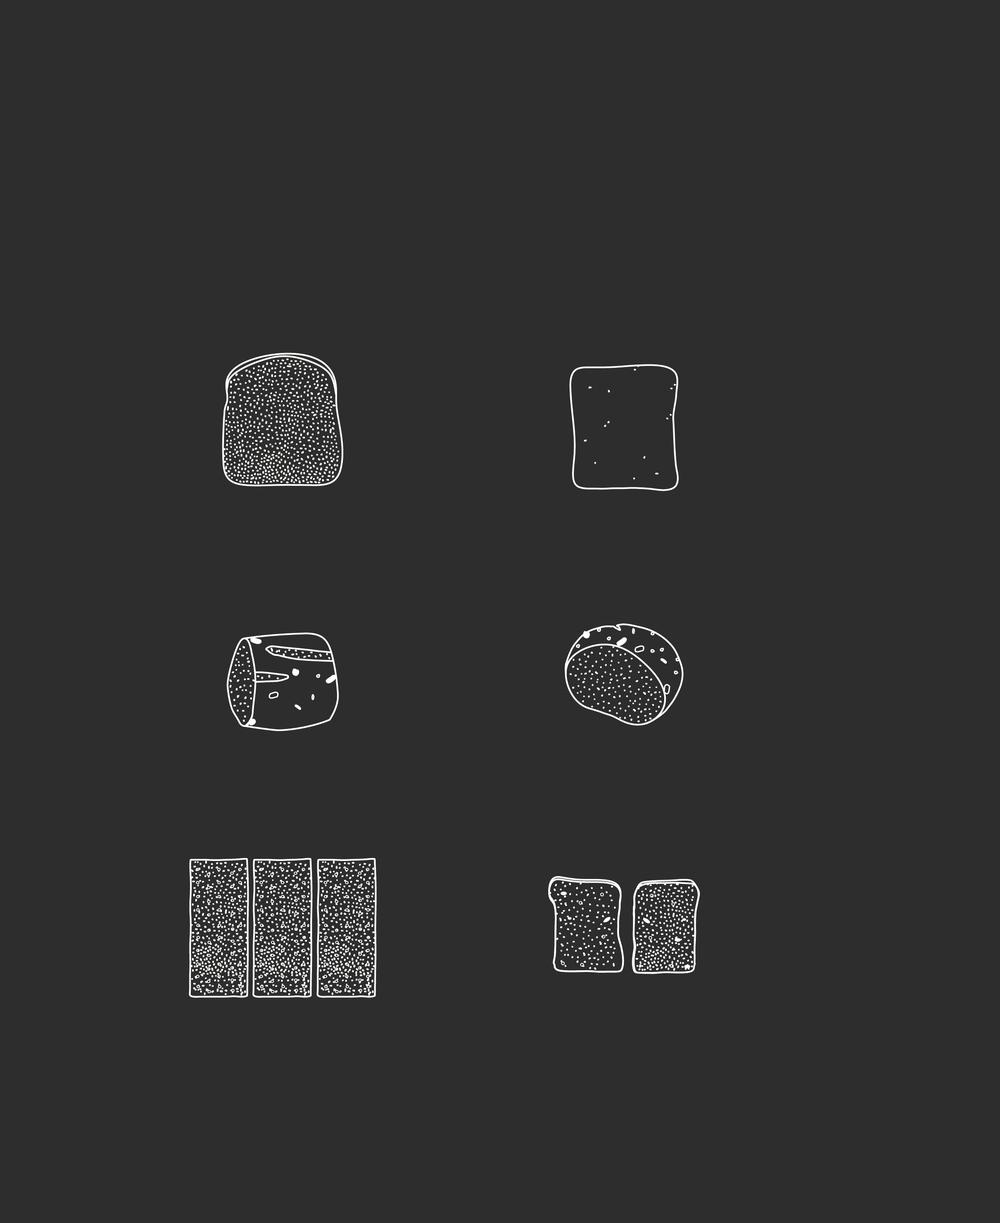 diabEET_brood en graanproducten 1.jpg